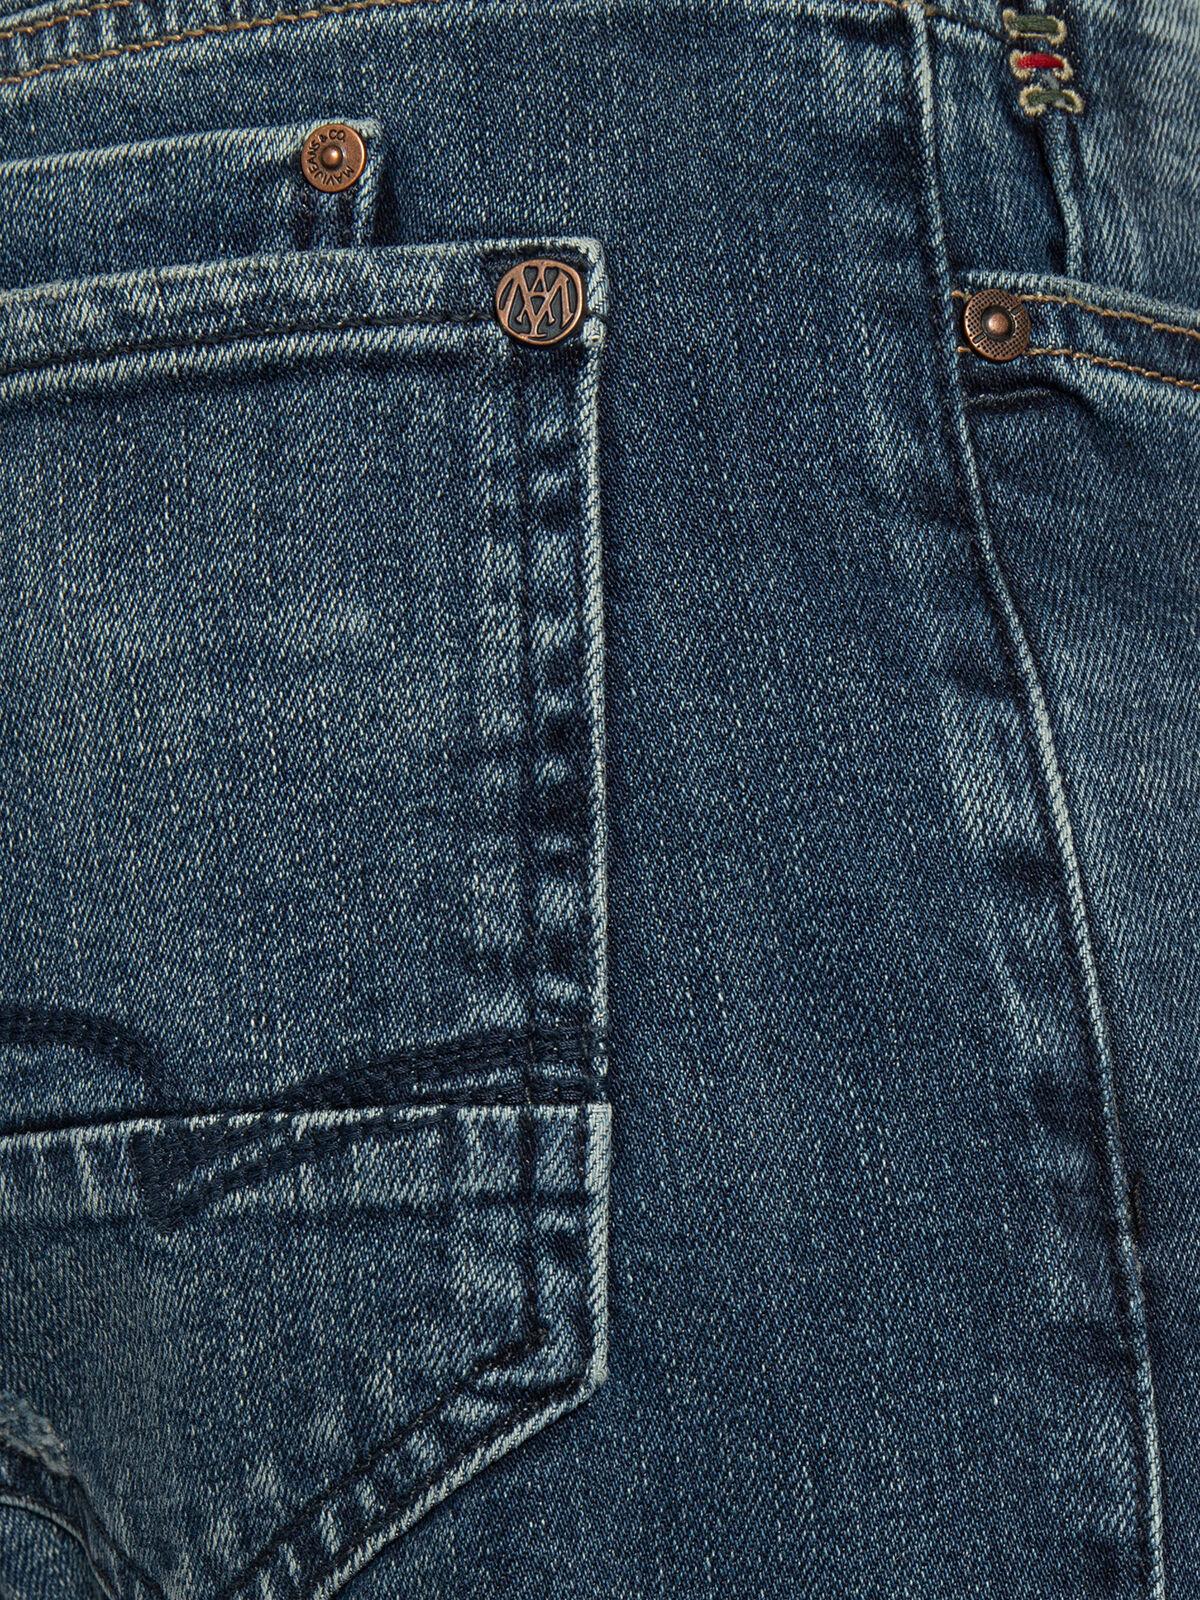 Chris Jeans